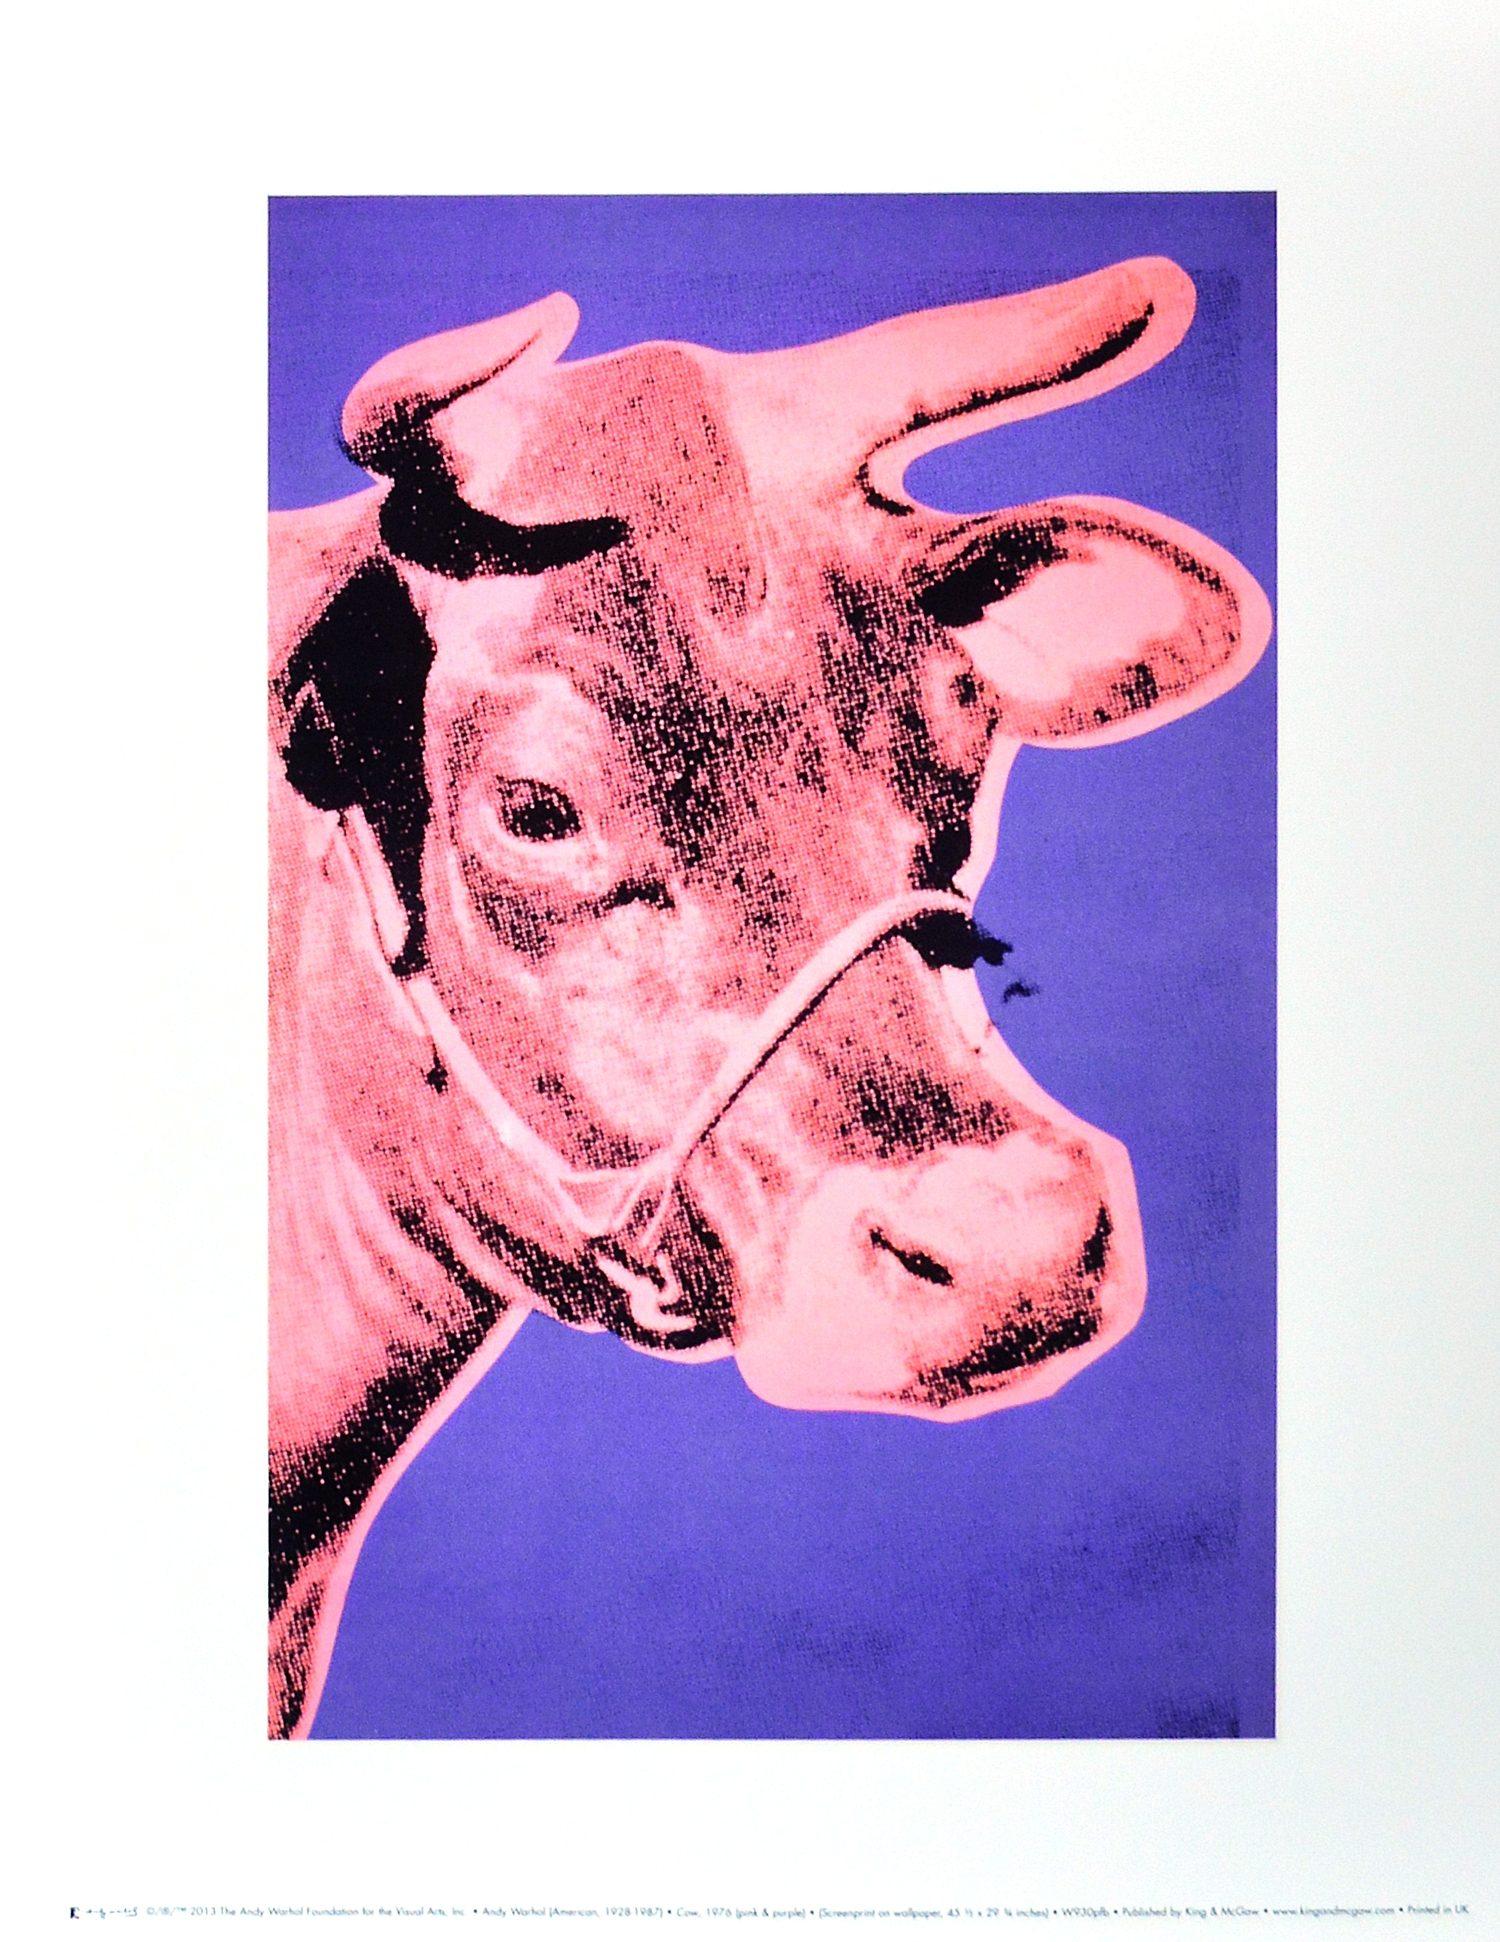 andy warhol cow 1976 pink purple poster kunstdruck bei. Black Bedroom Furniture Sets. Home Design Ideas